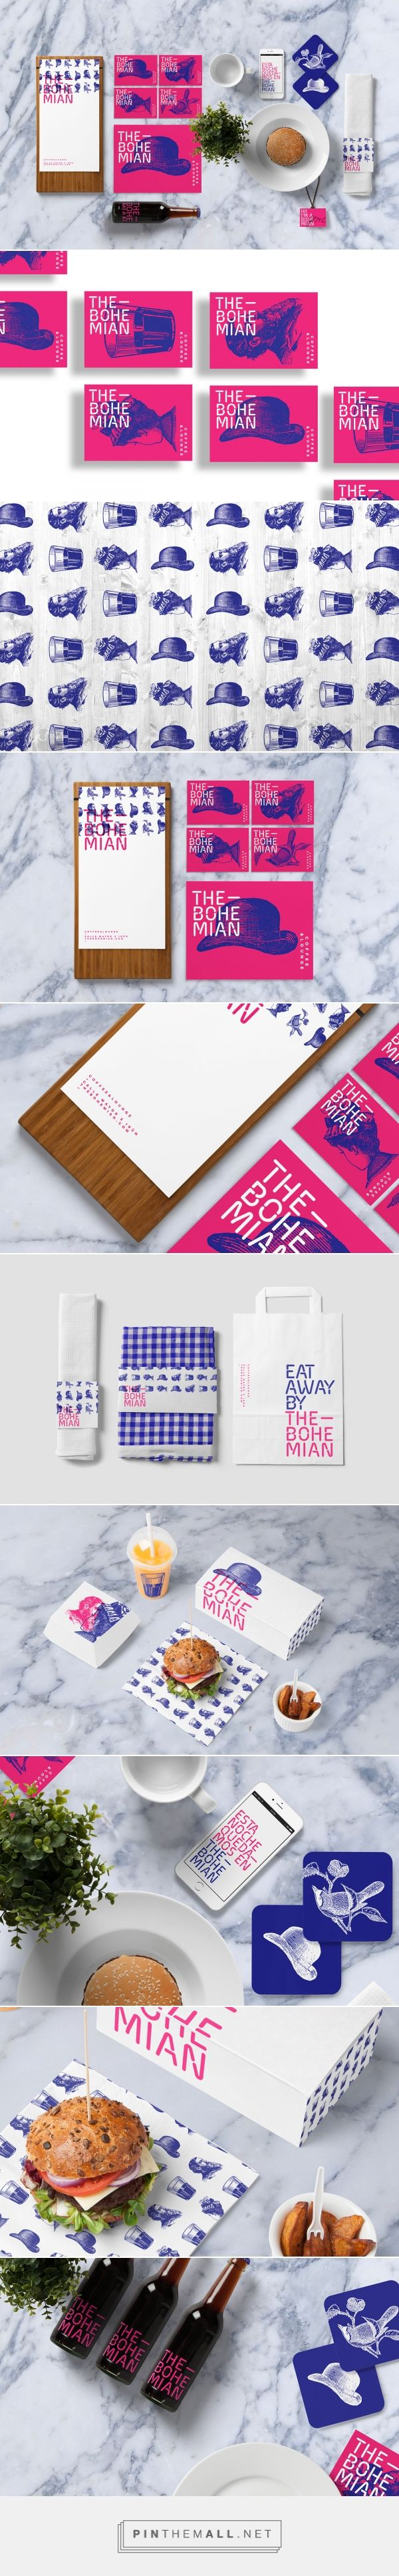 THE BOHEMIAN Coffee Lounge Branding by Quim Marin on Behance   Fivestar Branding – Design and Branding Agency & Inspiration Gallery